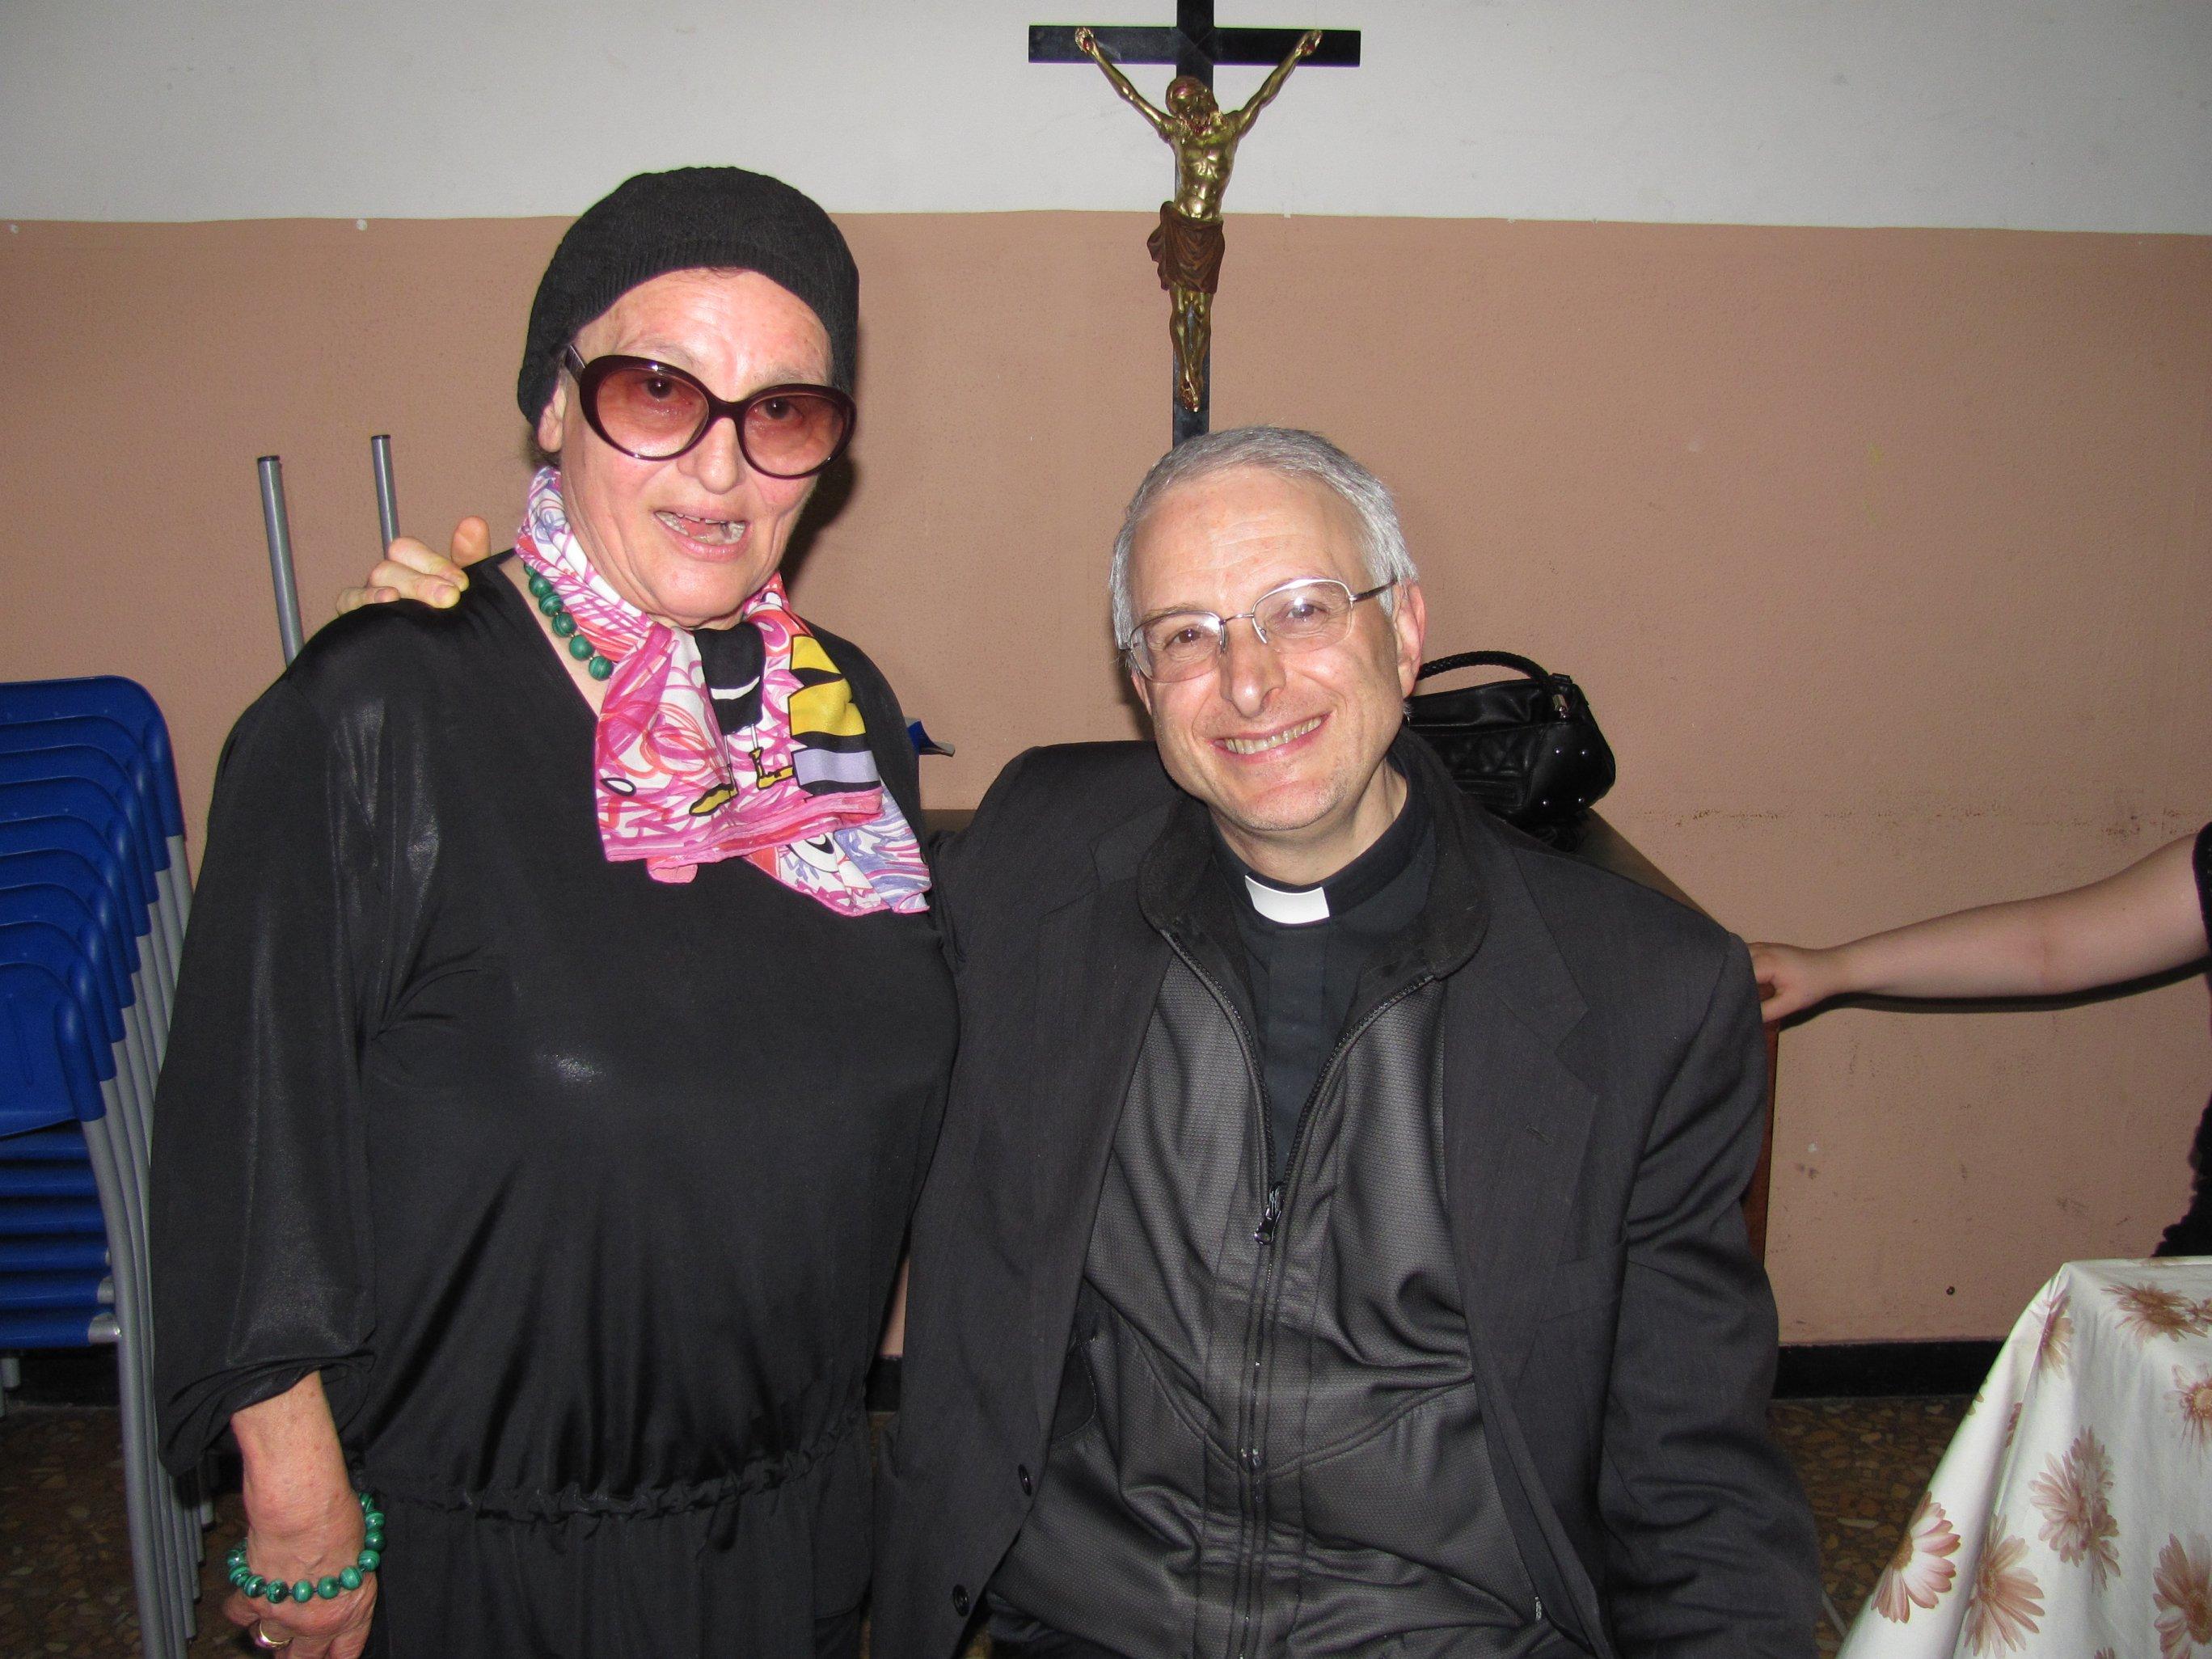 verifica_catechiste_2012-06-11-19-54-45